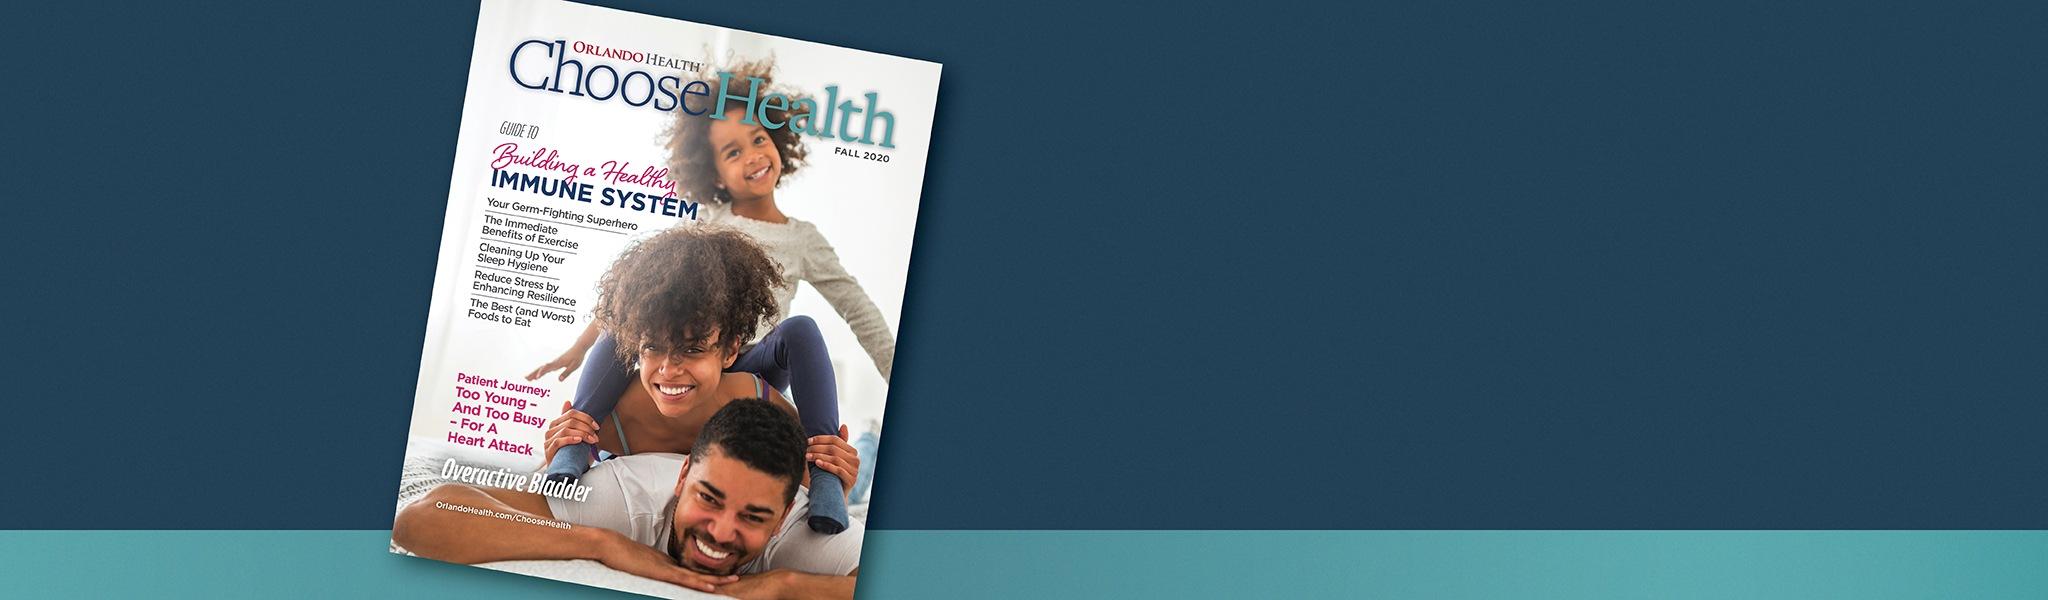 Choose Health Issue 13